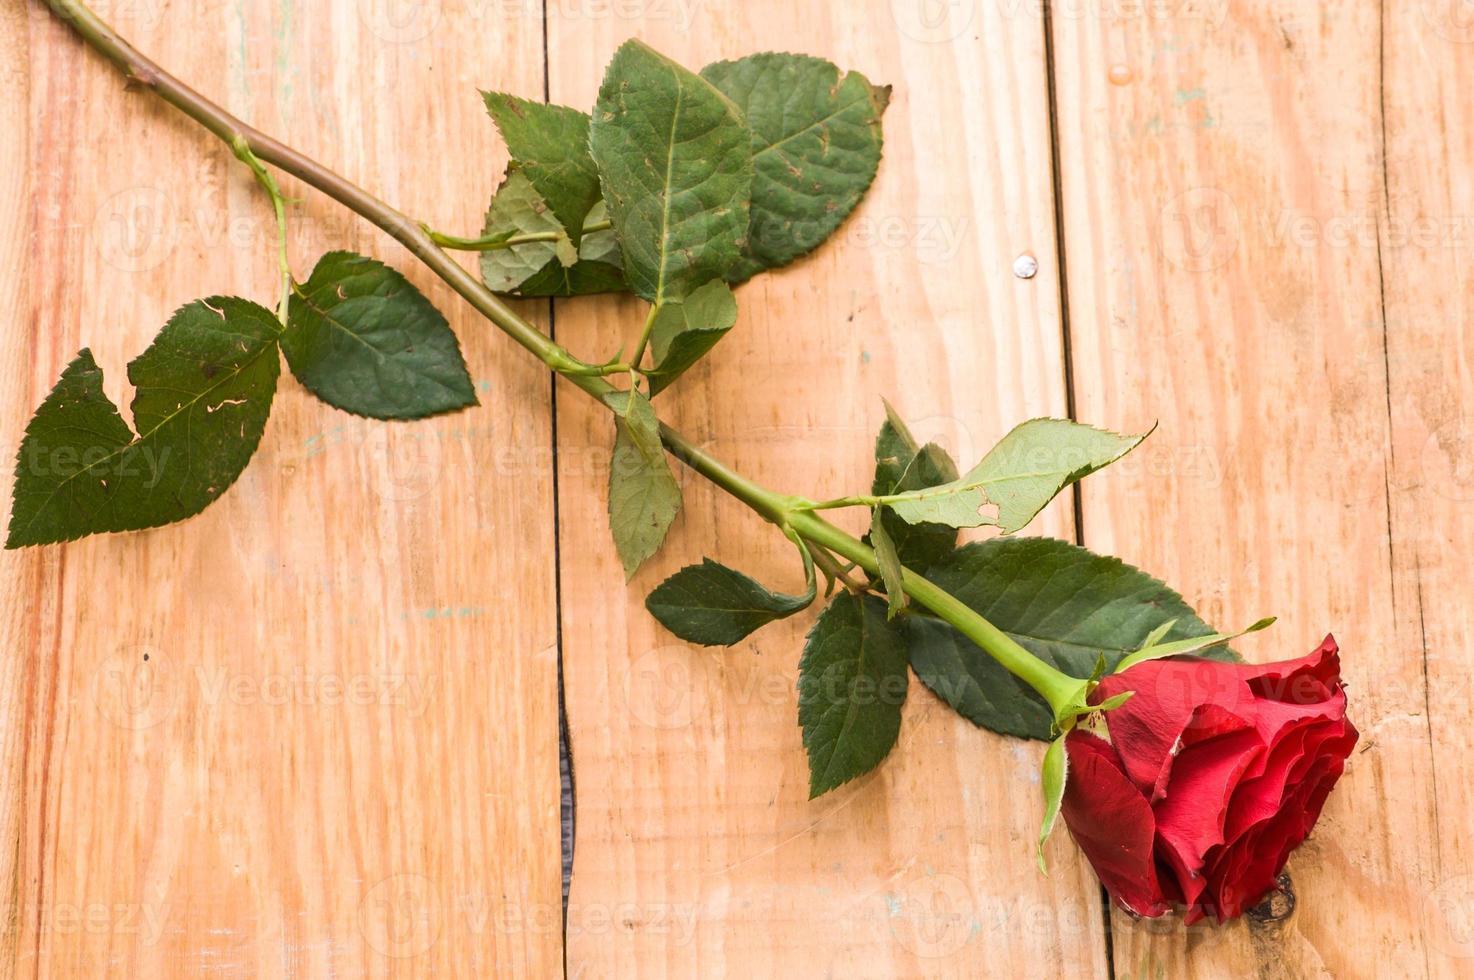 Red rose on vintage wooden planks background photo